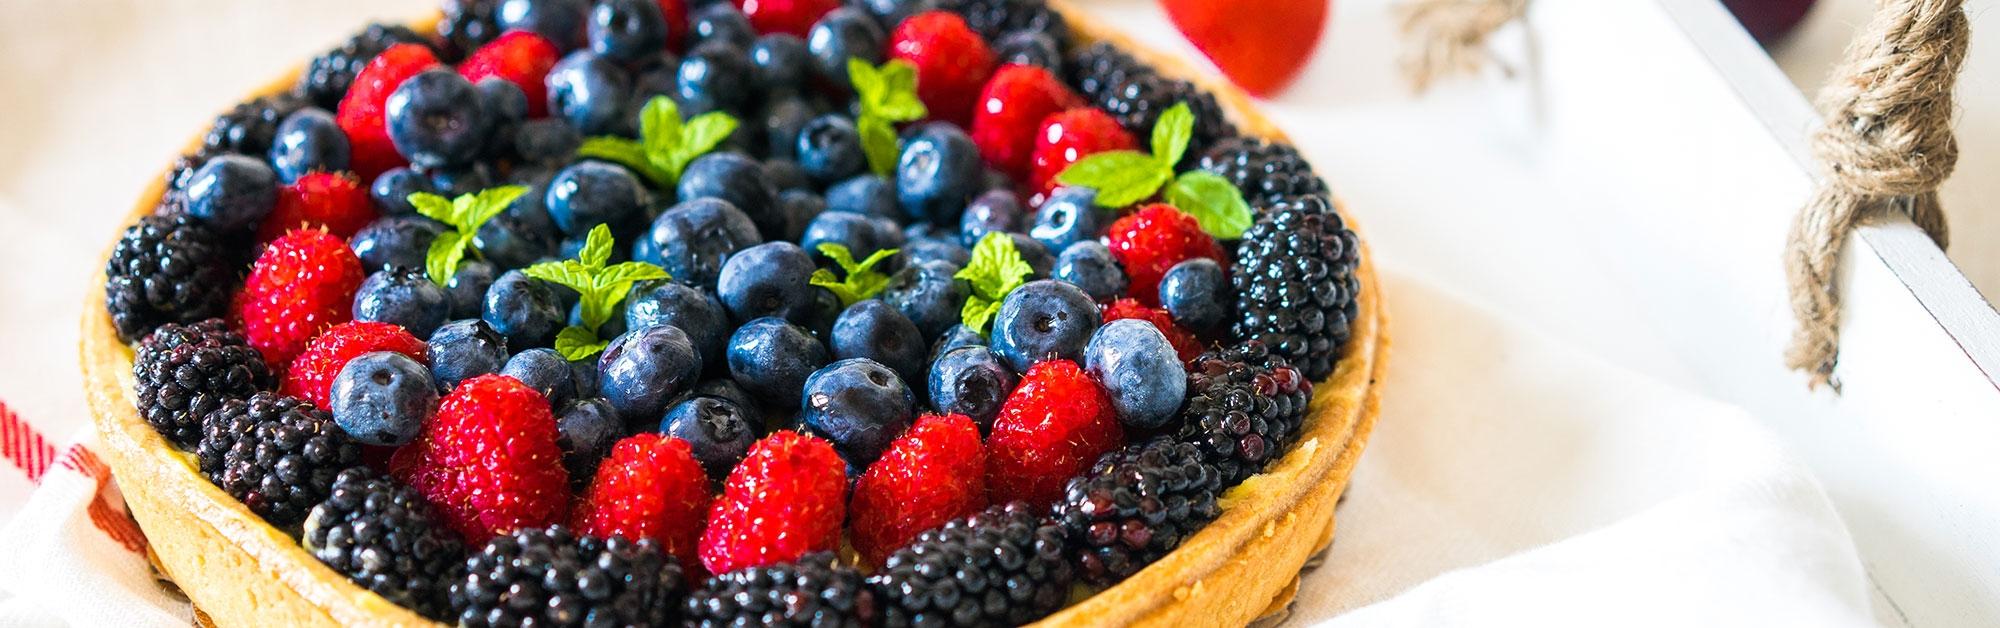 Tartaleta de berries